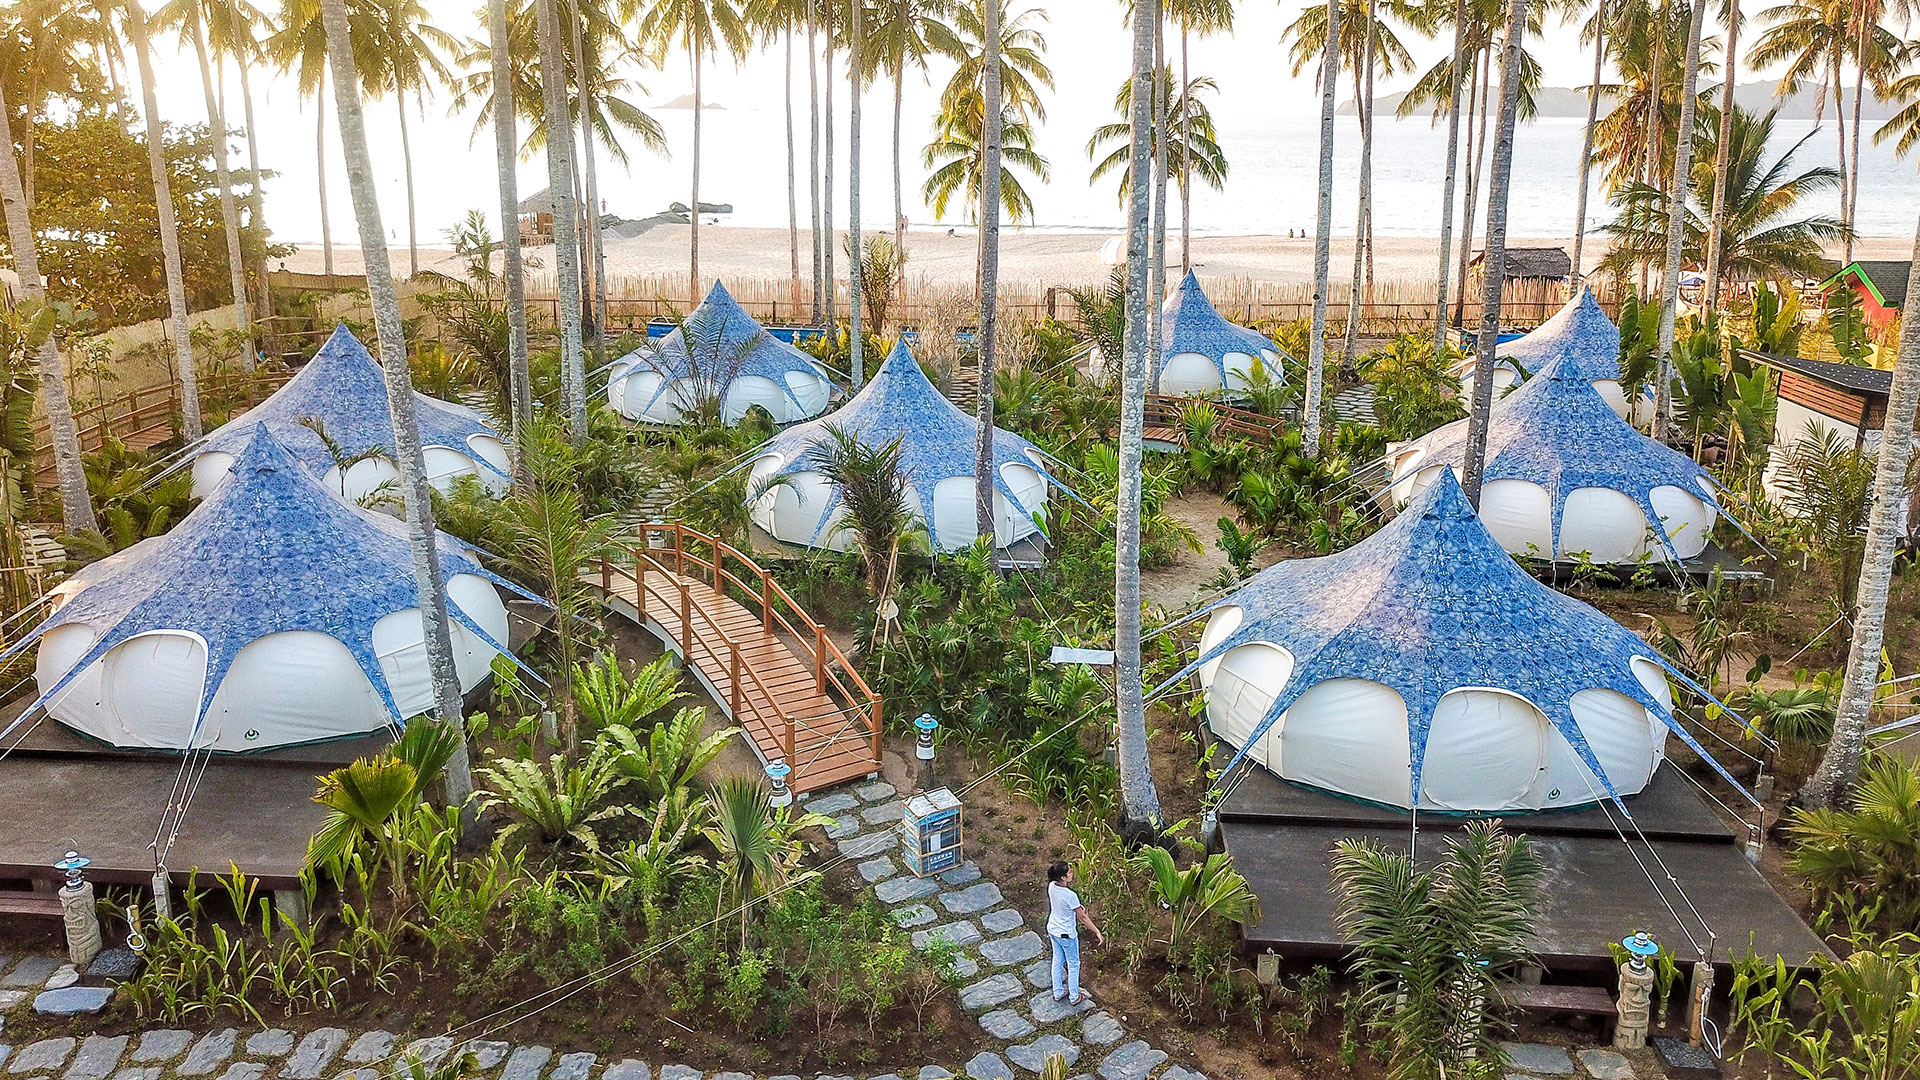 Top 11 Glamping Resorts in the Philippines: El Nido, Batangas, Siargao